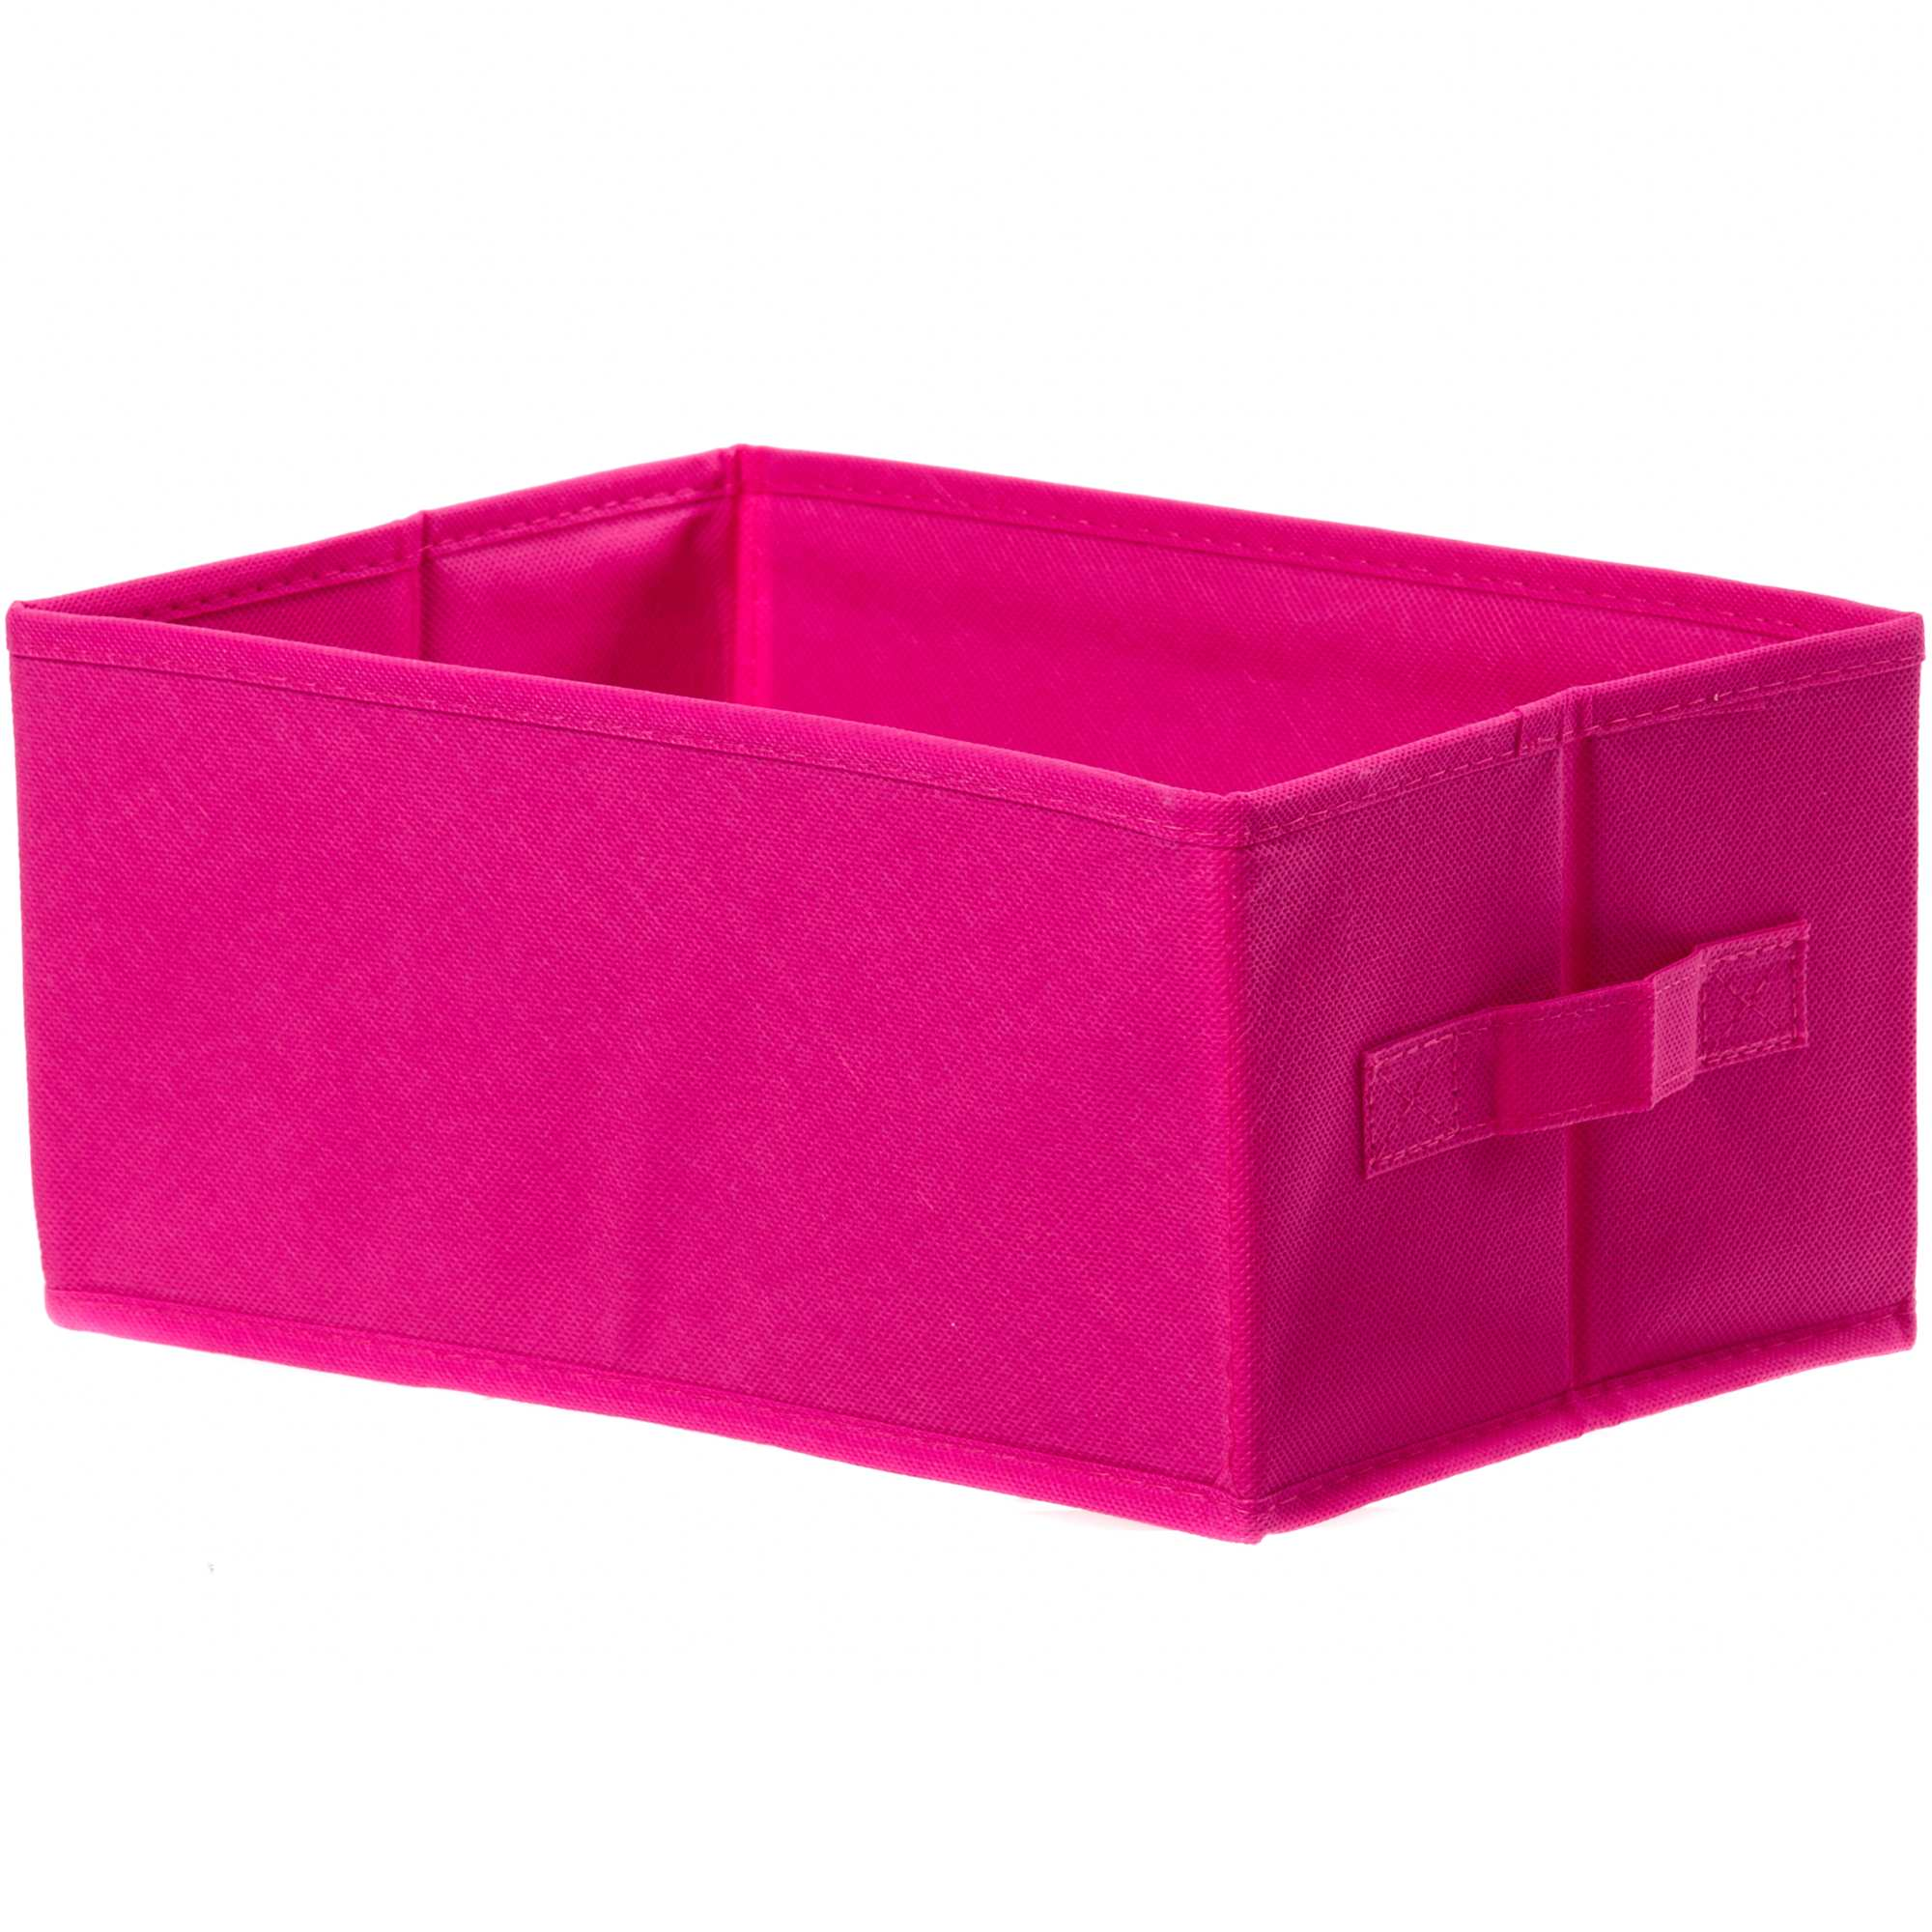 petit panier pliable linge de lit fuchsia kiabi 3 00. Black Bedroom Furniture Sets. Home Design Ideas